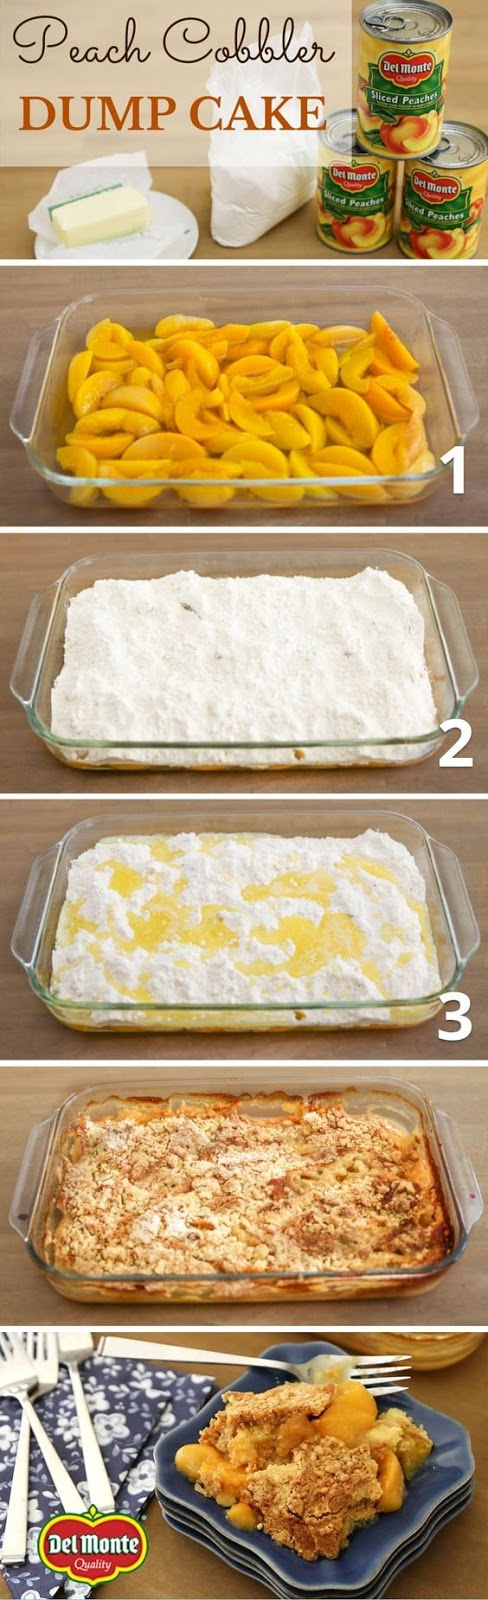 Choice Morsels Good Eating Monday Peach Cobbler Dump Cake